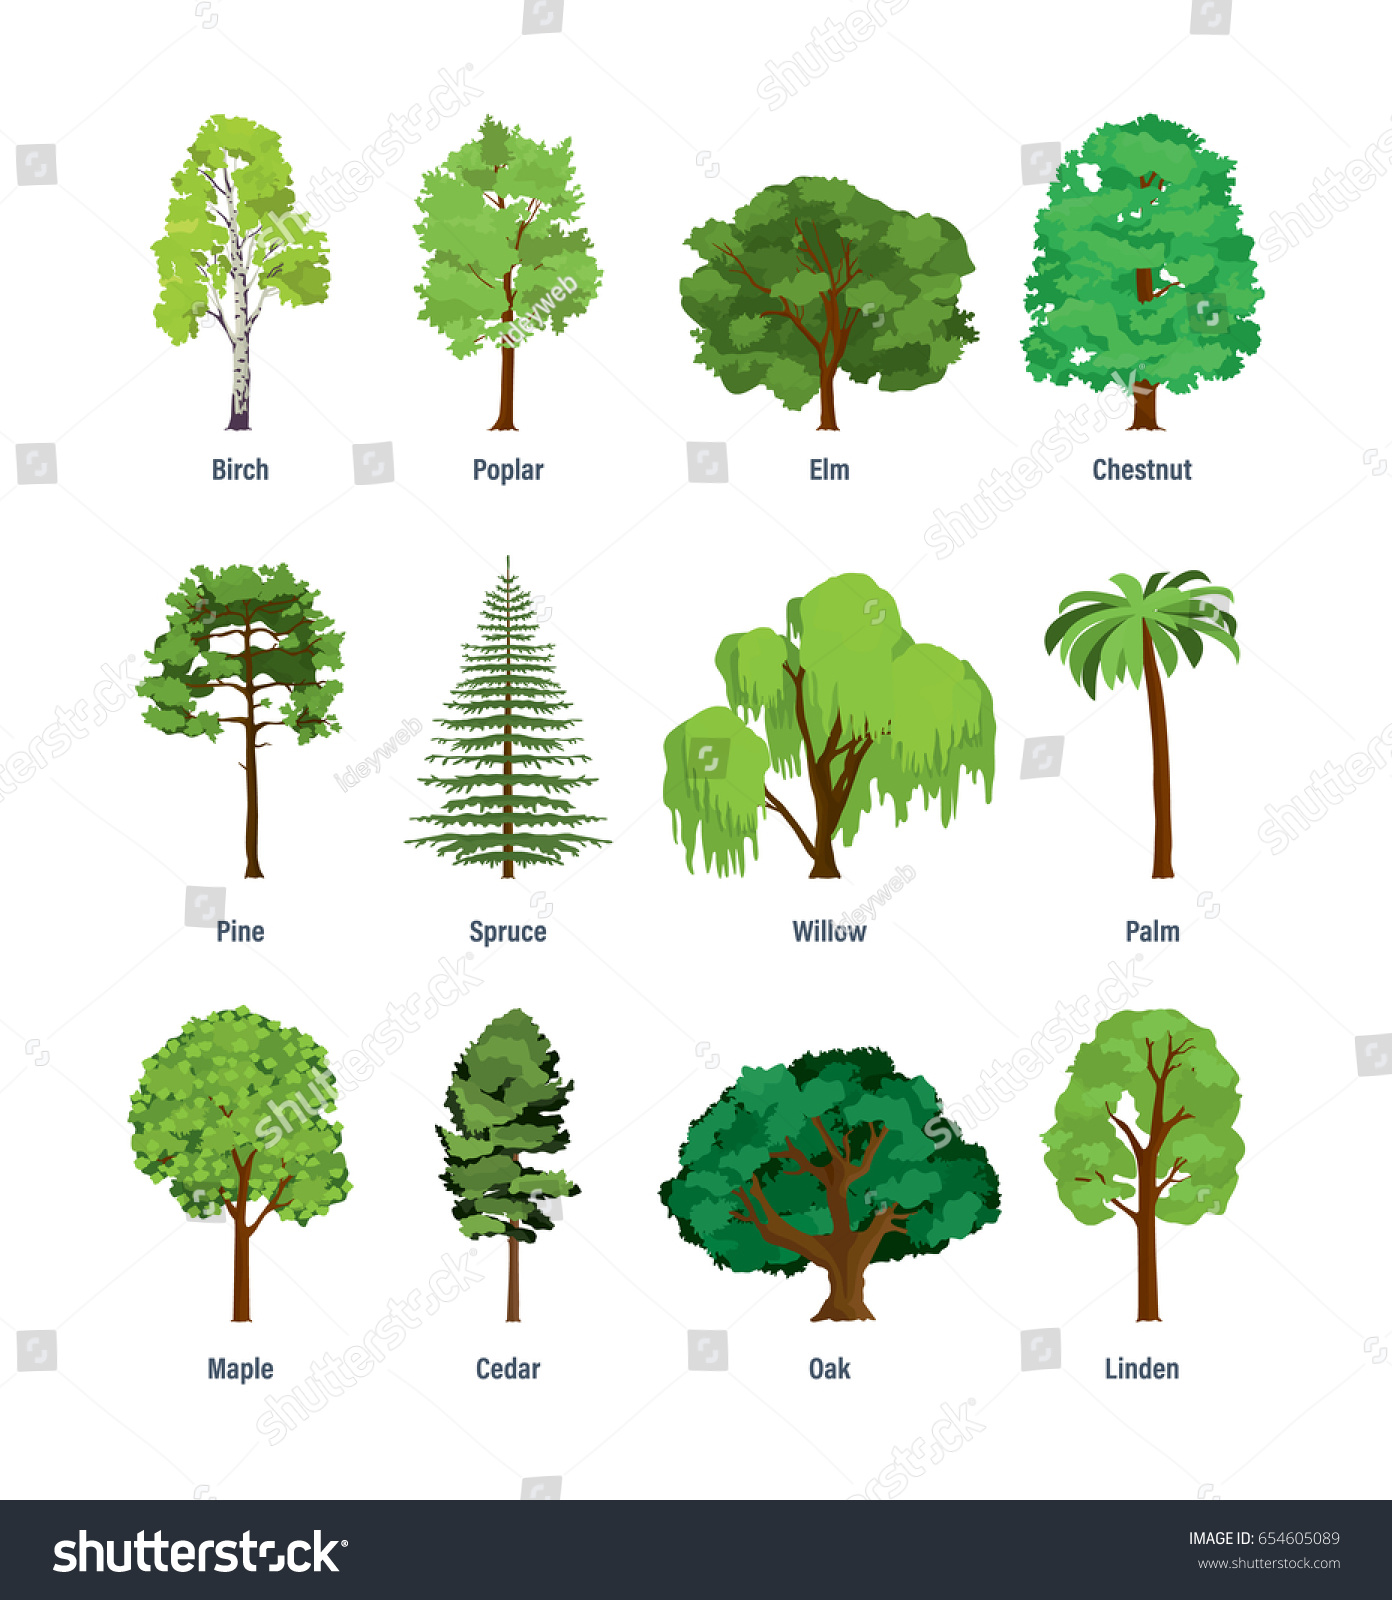 Elm Tree Diagram   Diagram & Symbol Wiring symbol penny   symbol ...